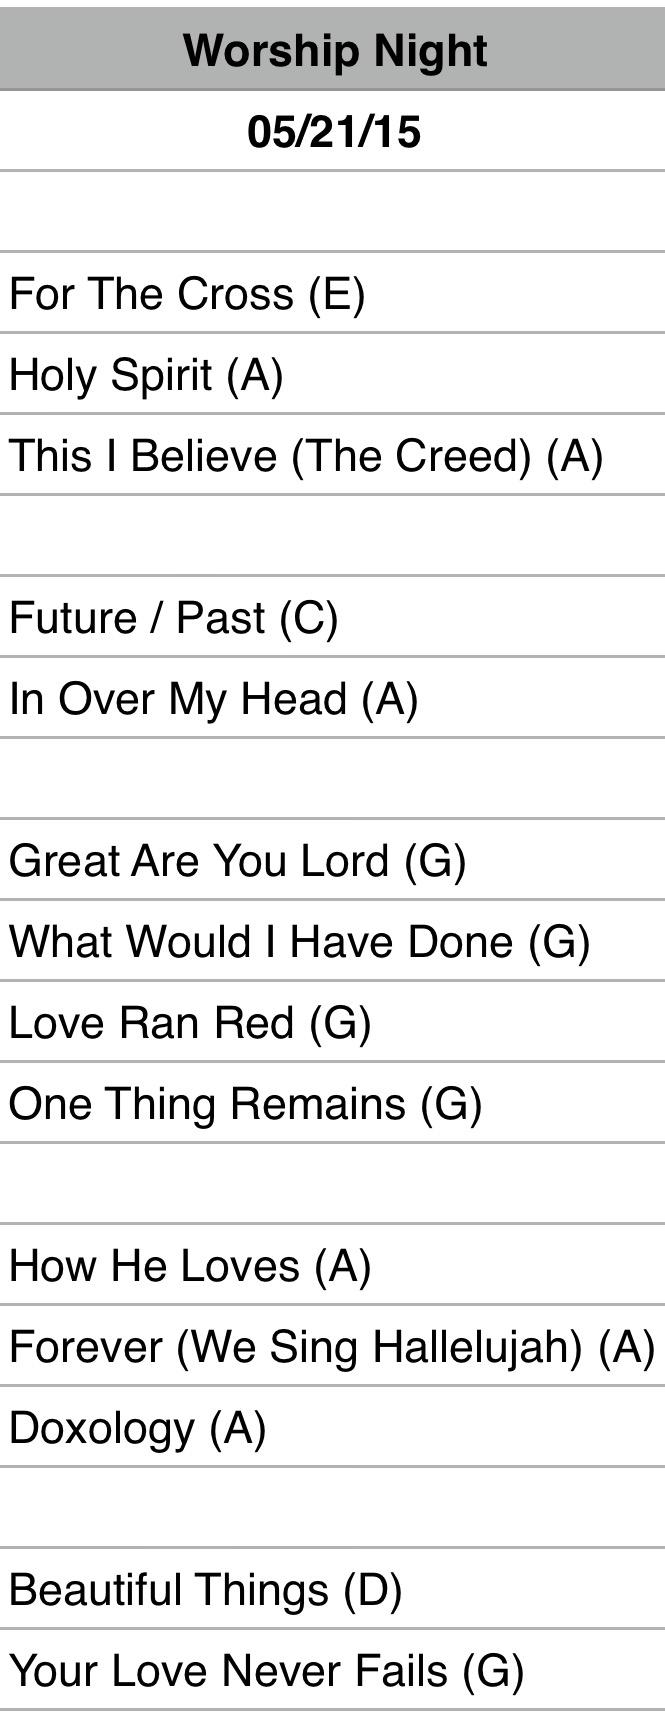 Worship Night Set List 052115